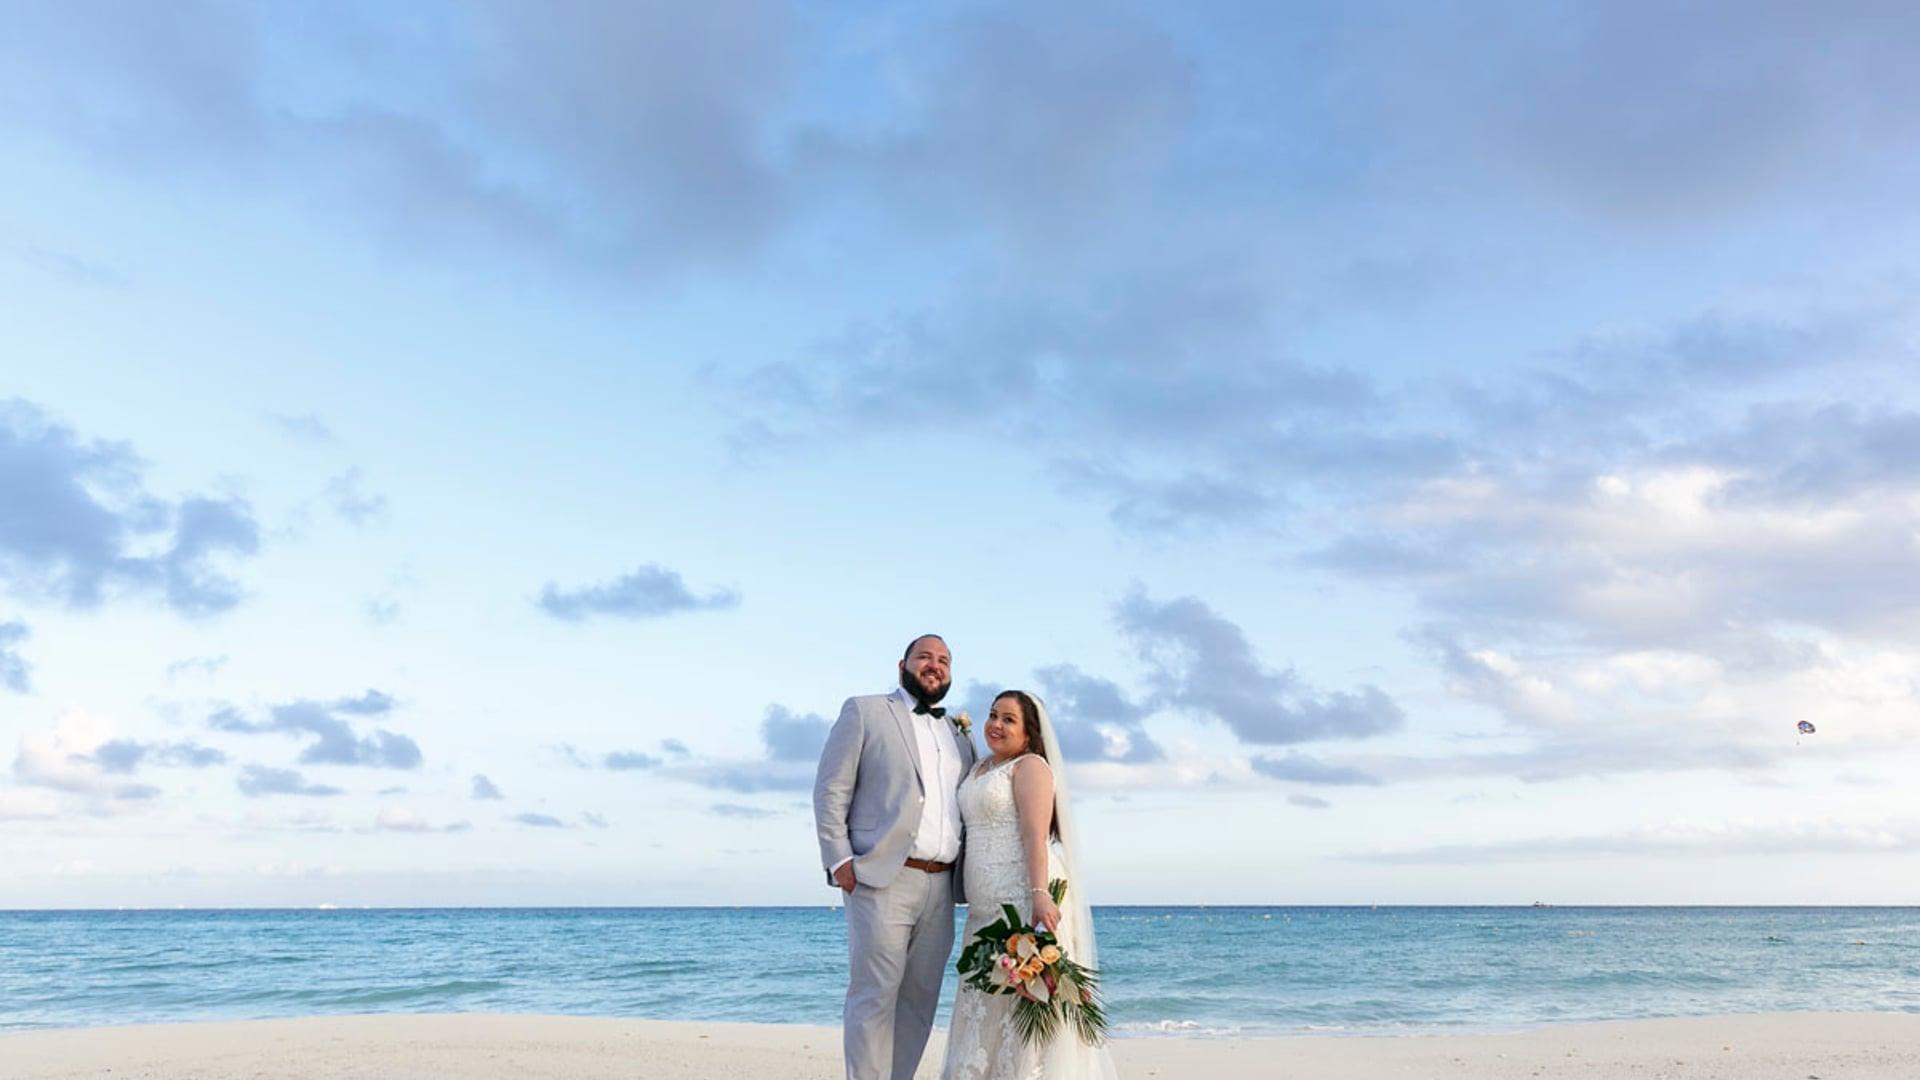 Sandos Playacar Wedding Film. Maria & Eisac